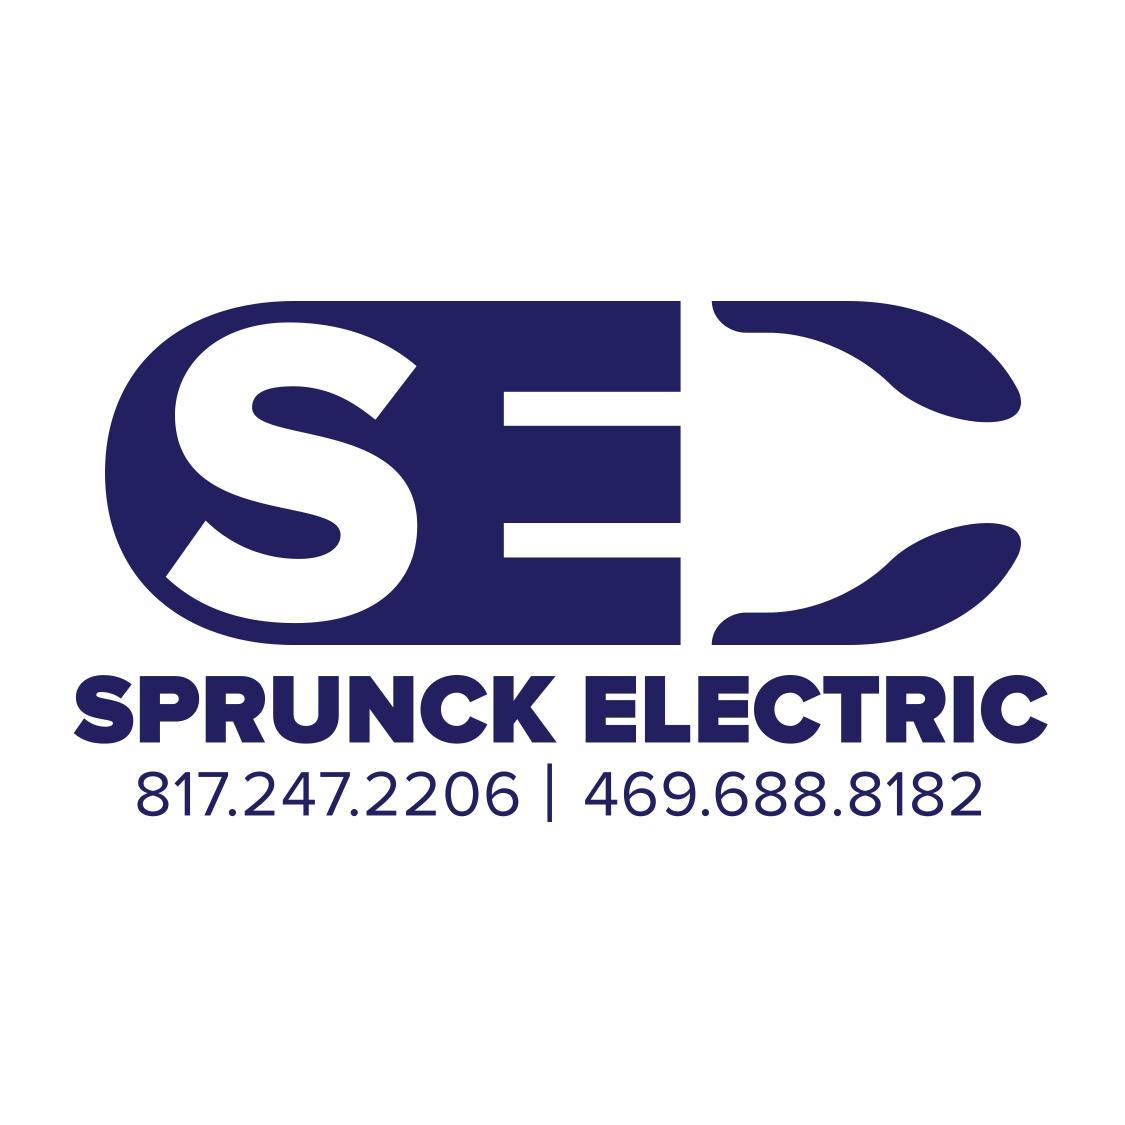 Sprunck Electric, LLC